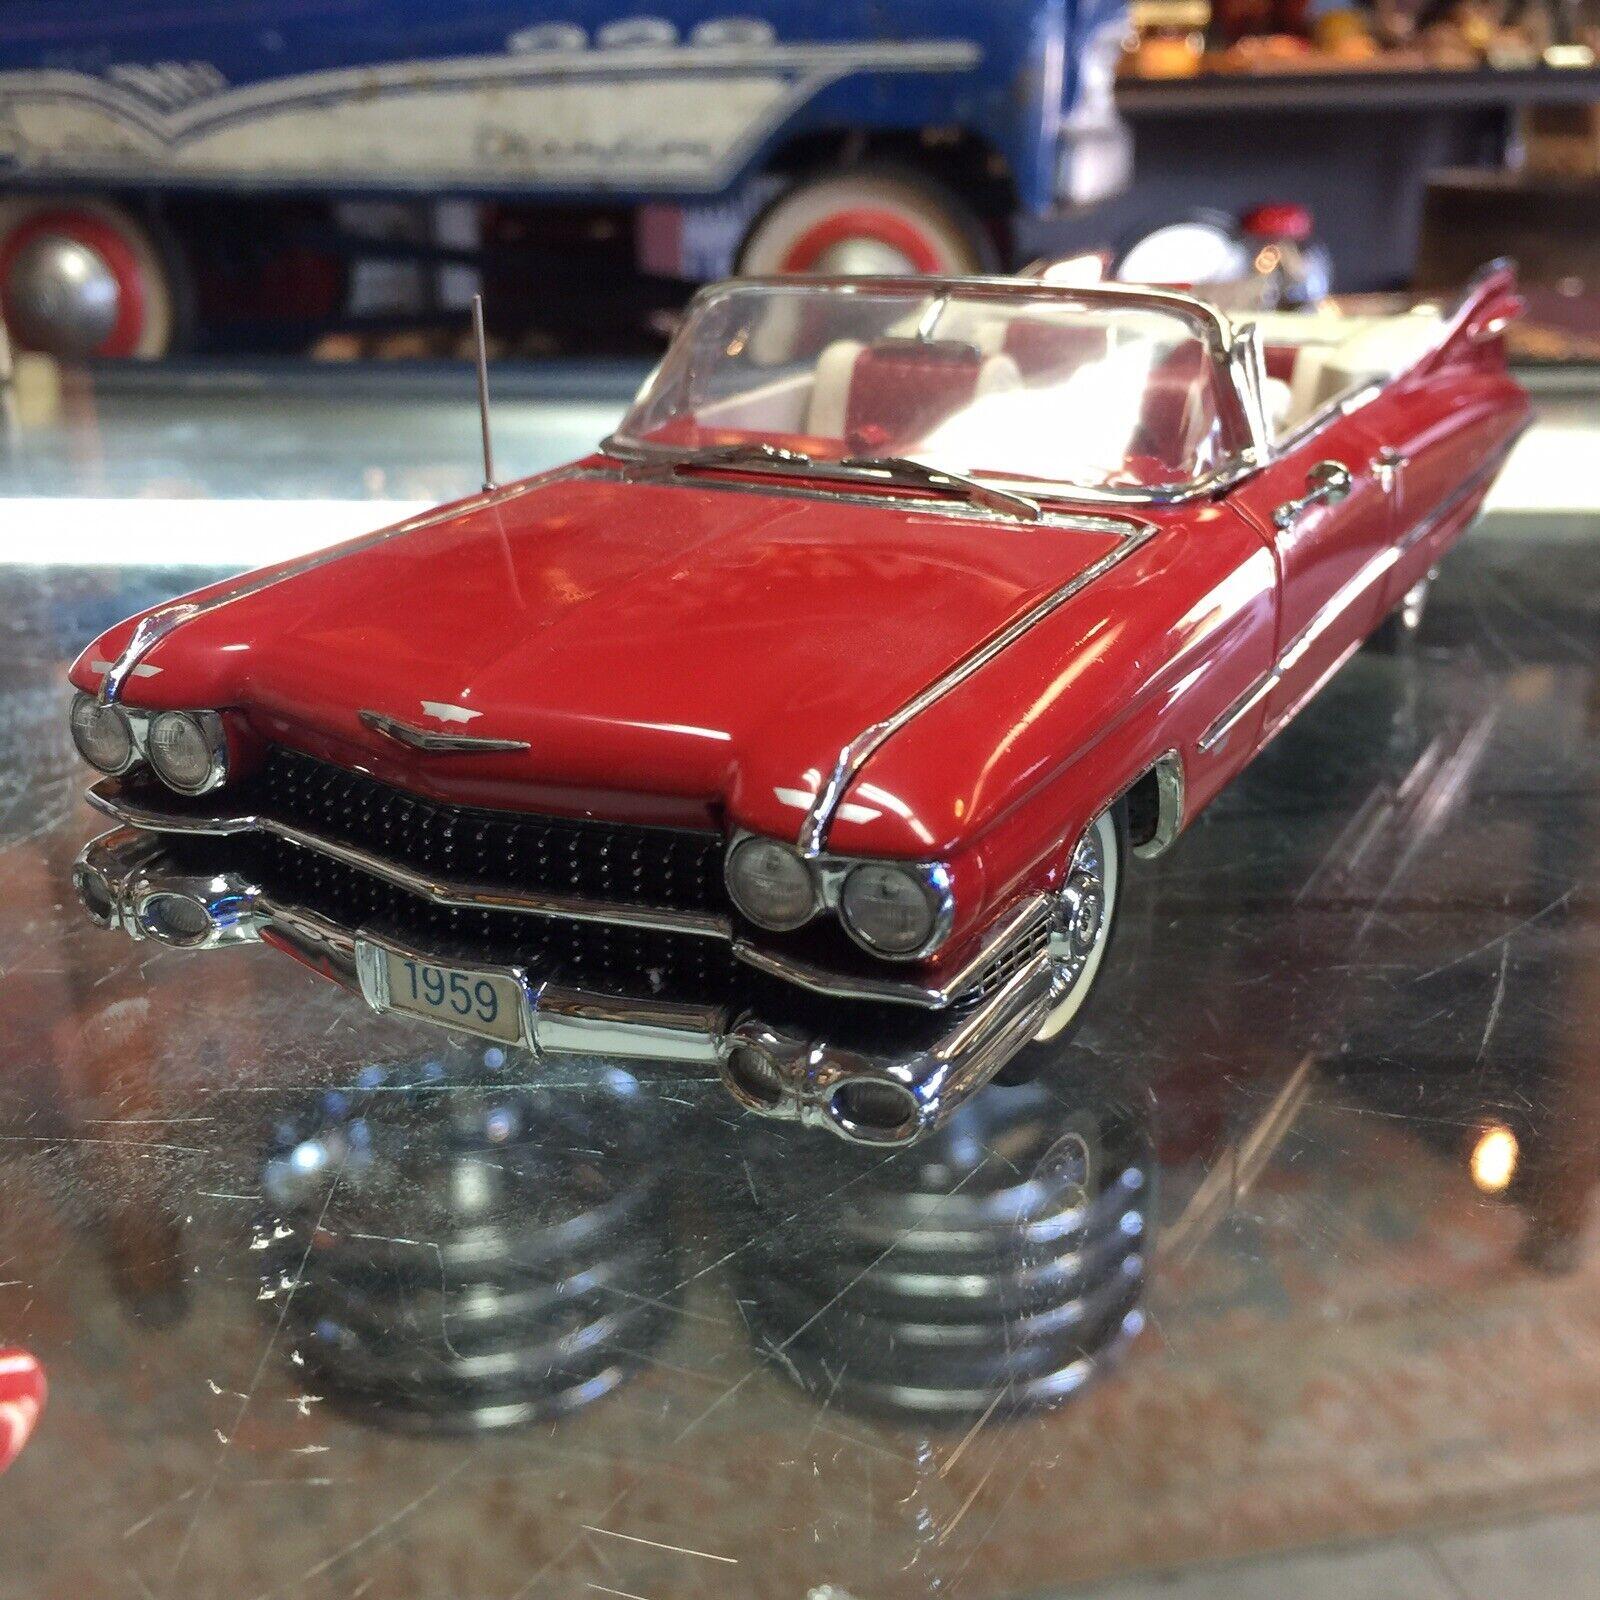 Danbury Mint Die Cast 1959 Cadillac serier 62 Kongrönible med Box Colleptible